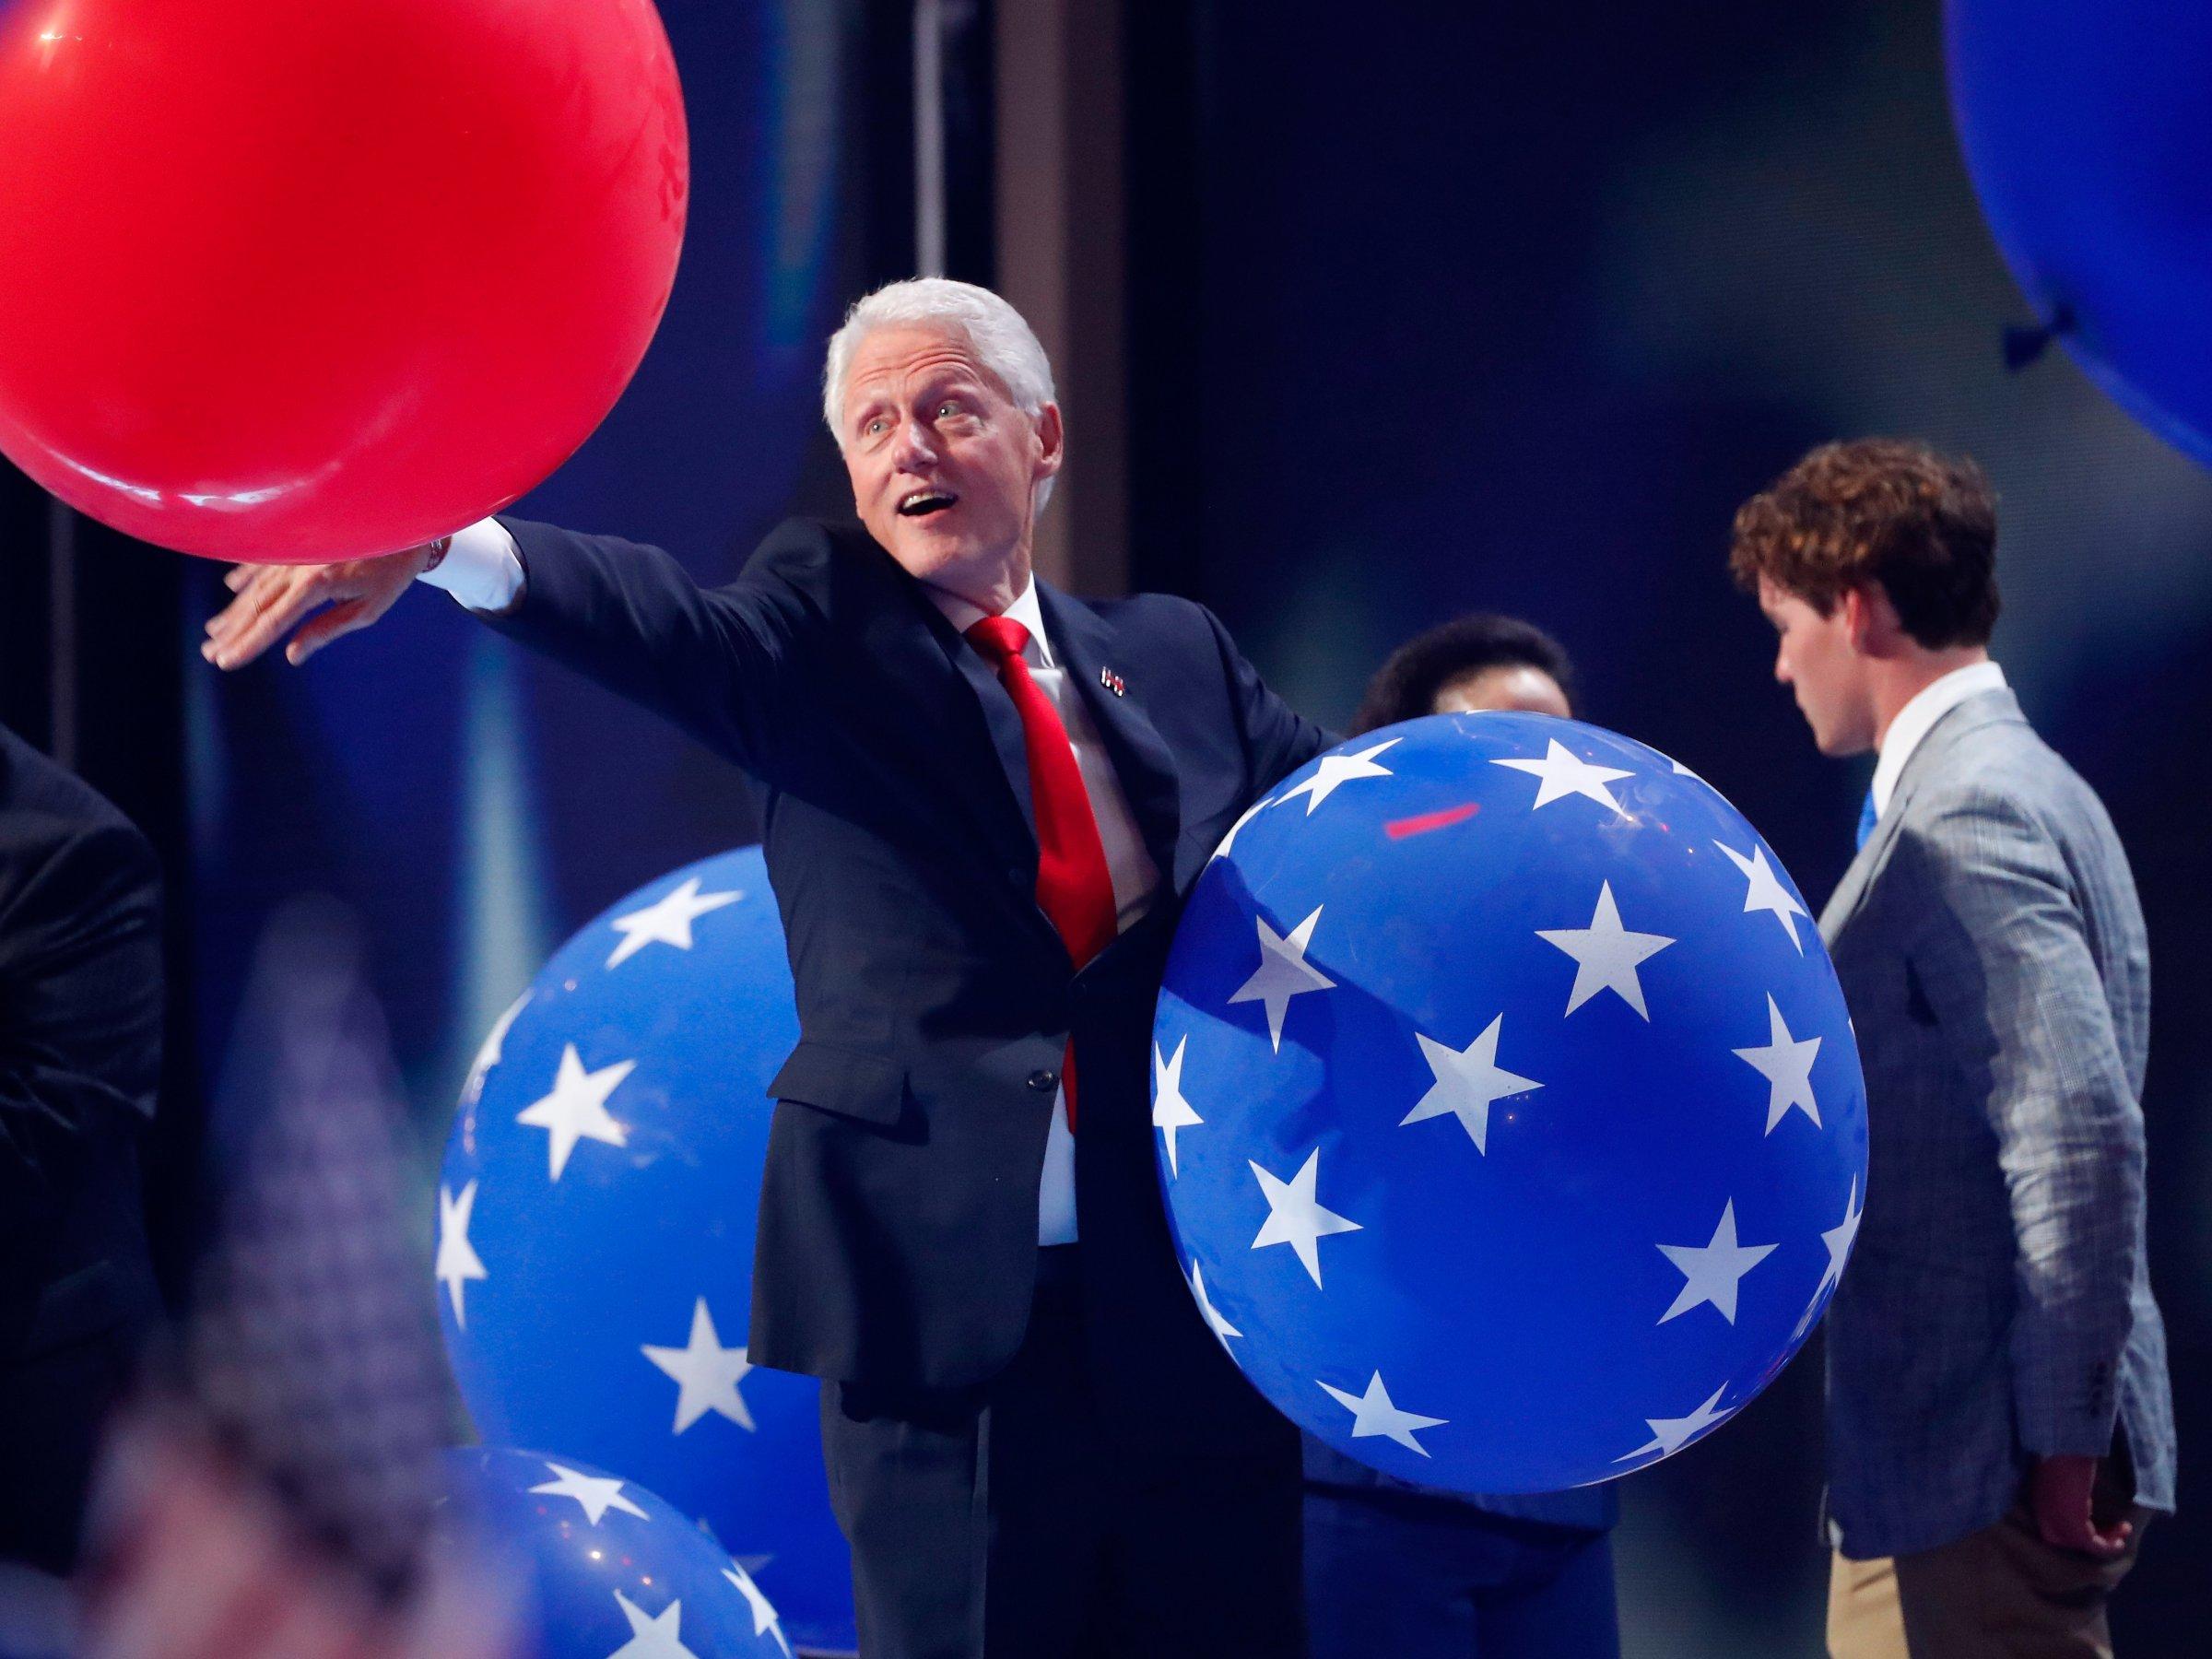 Bill Clinton's Ritzy Birthday Gala Is Mega $$ Fundraiser for Family Foundation [VIDEOS]